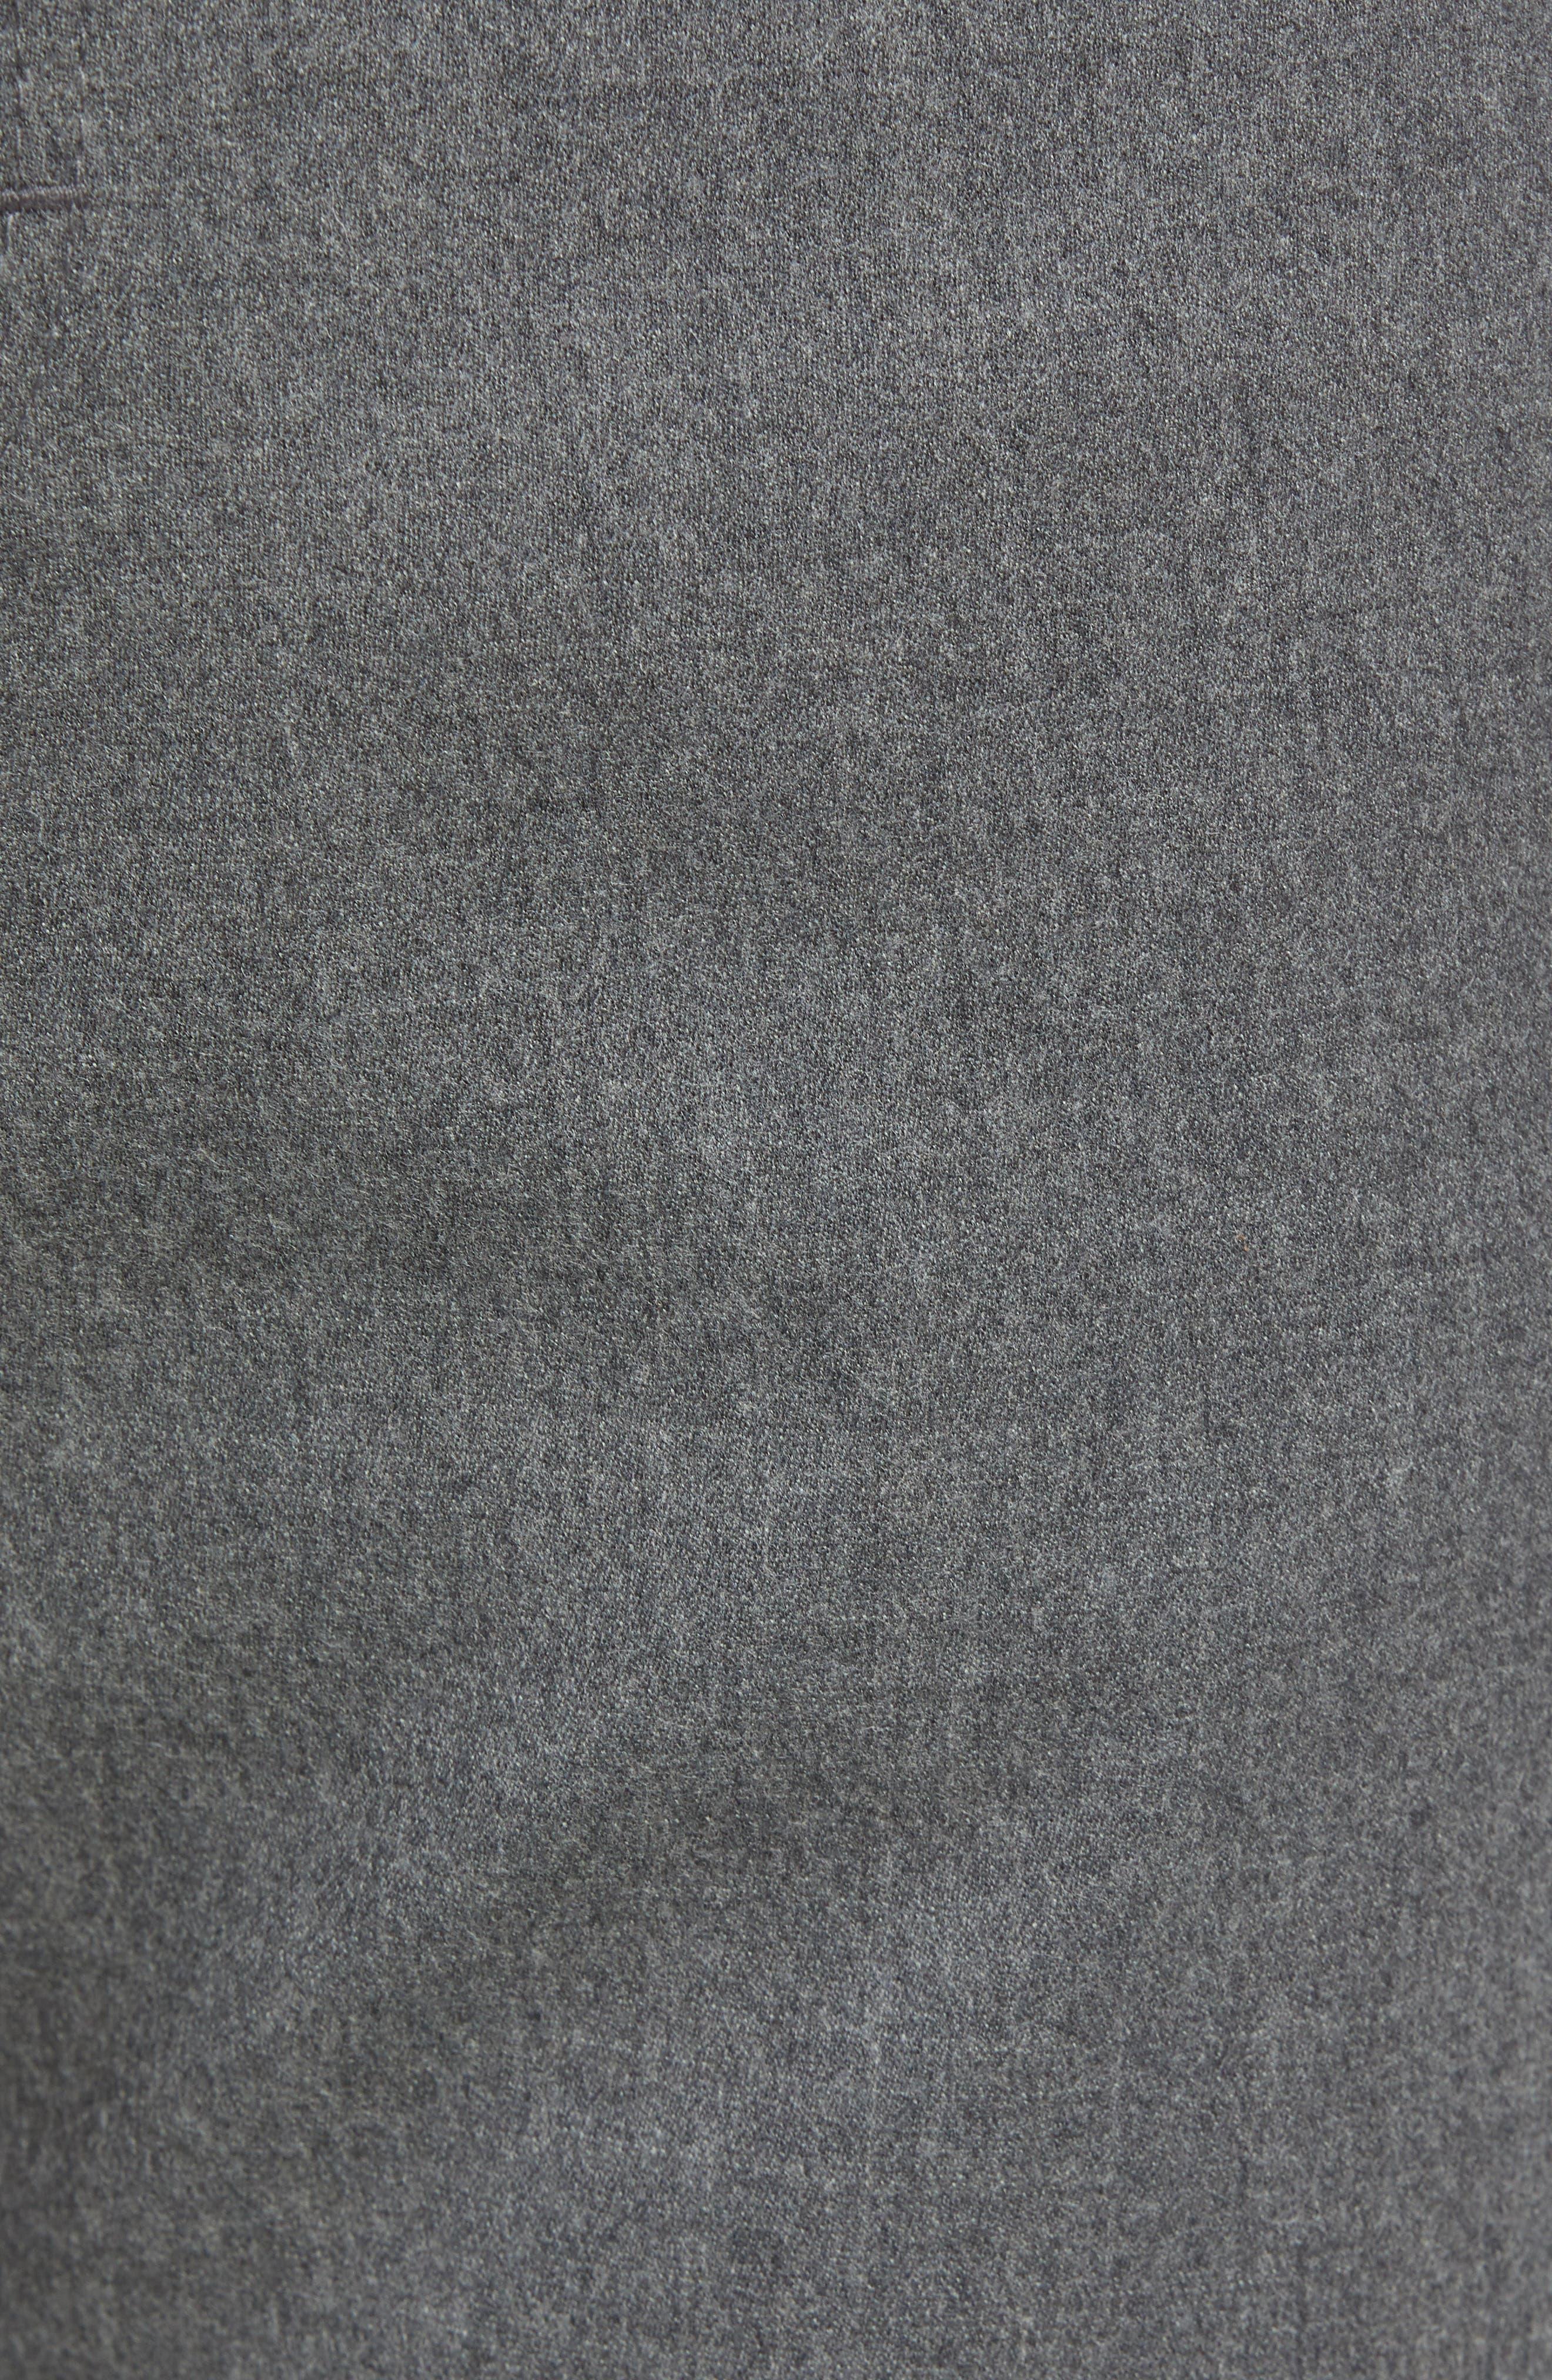 Enrico Five-Pocket Stretch Wool Trousers,                             Alternate thumbnail 5, color,                             GRAPHITE